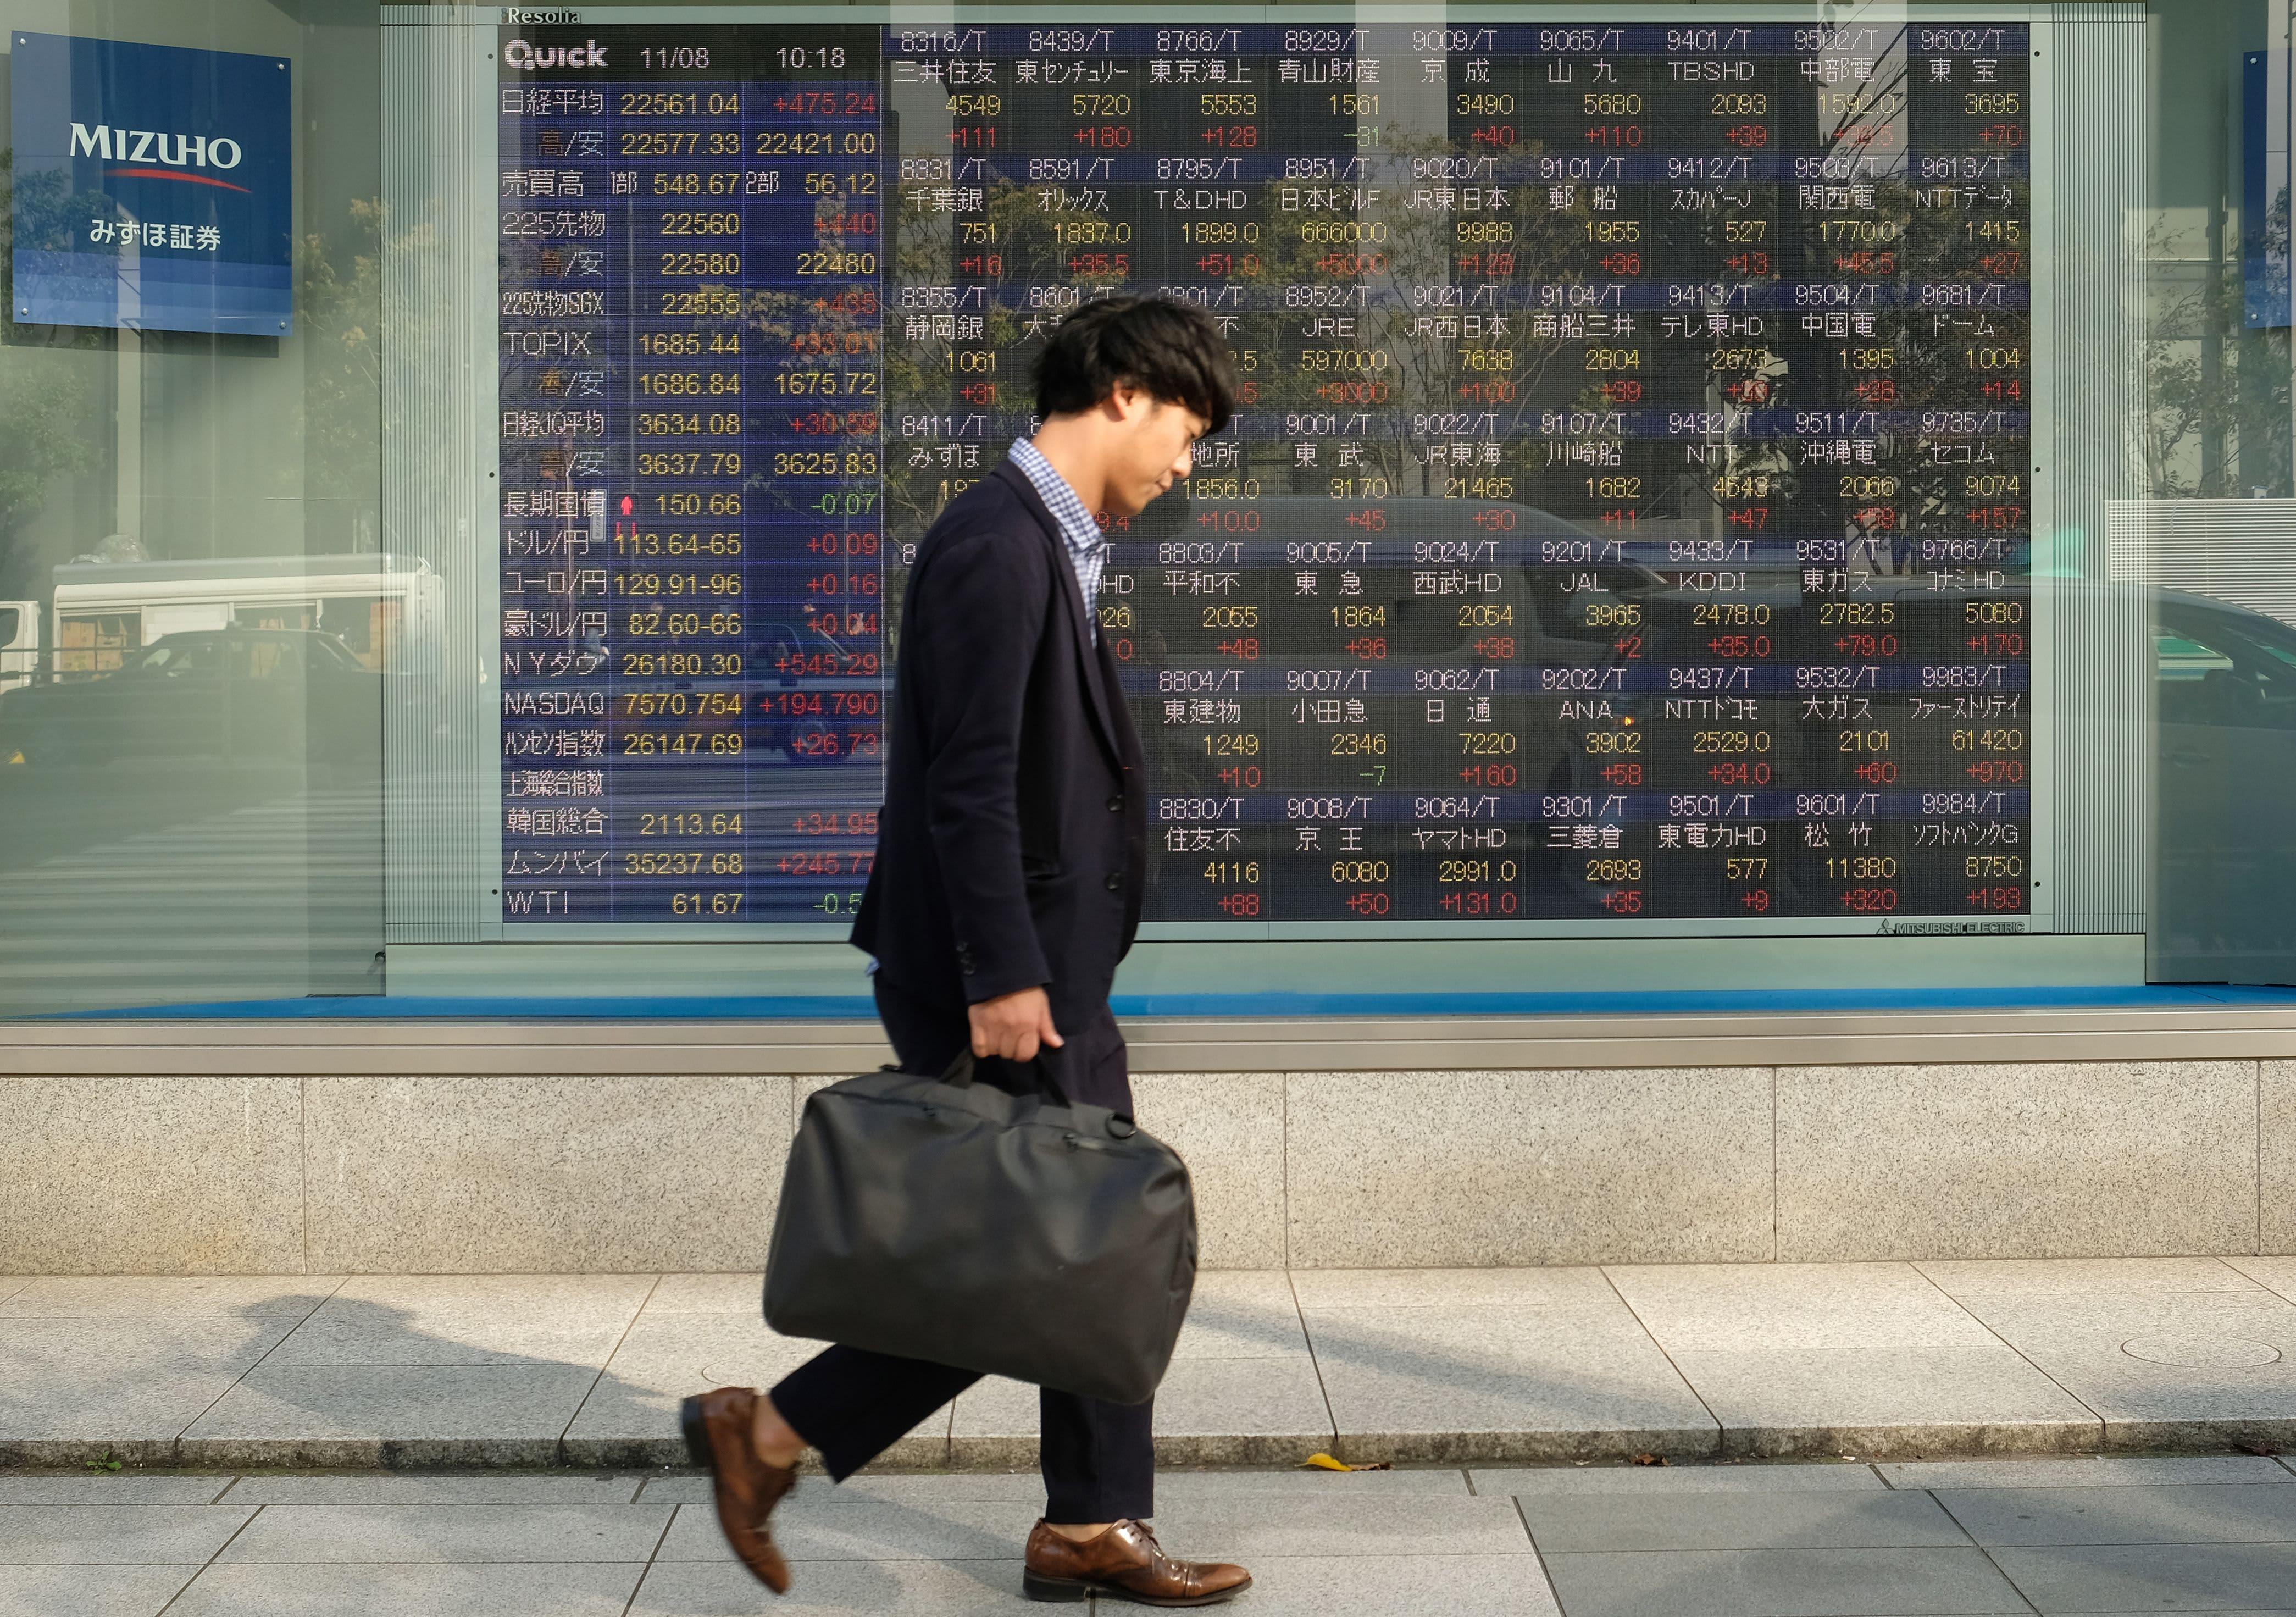 Hong Kong markets tumble to close 2.6% lower as tensions soar